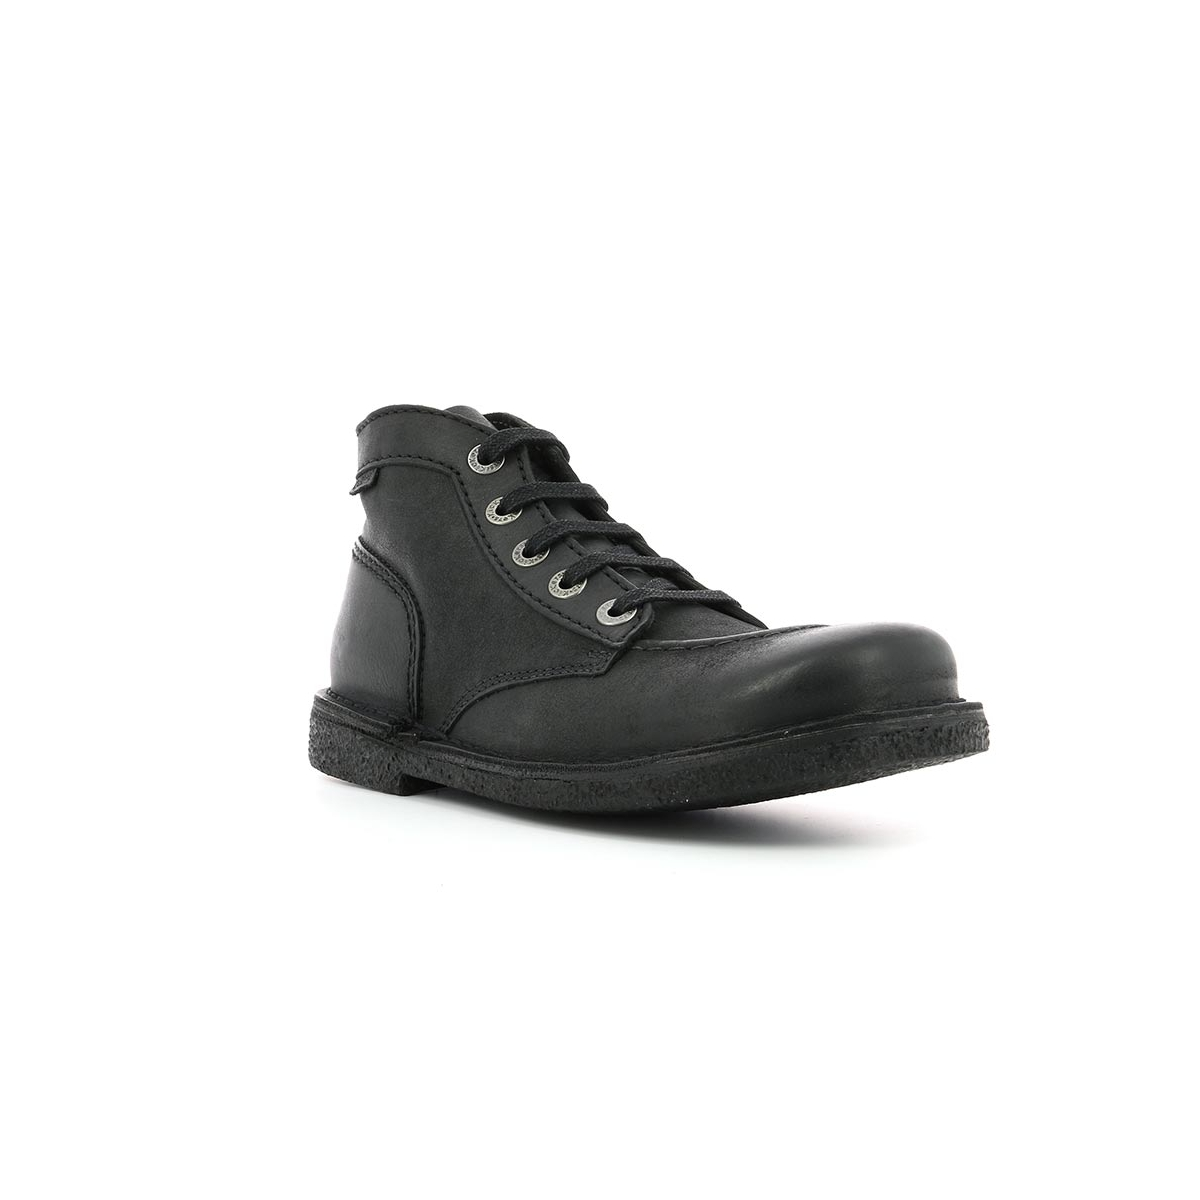 chaussures femme legendiknew noir kickers. Black Bedroom Furniture Sets. Home Design Ideas